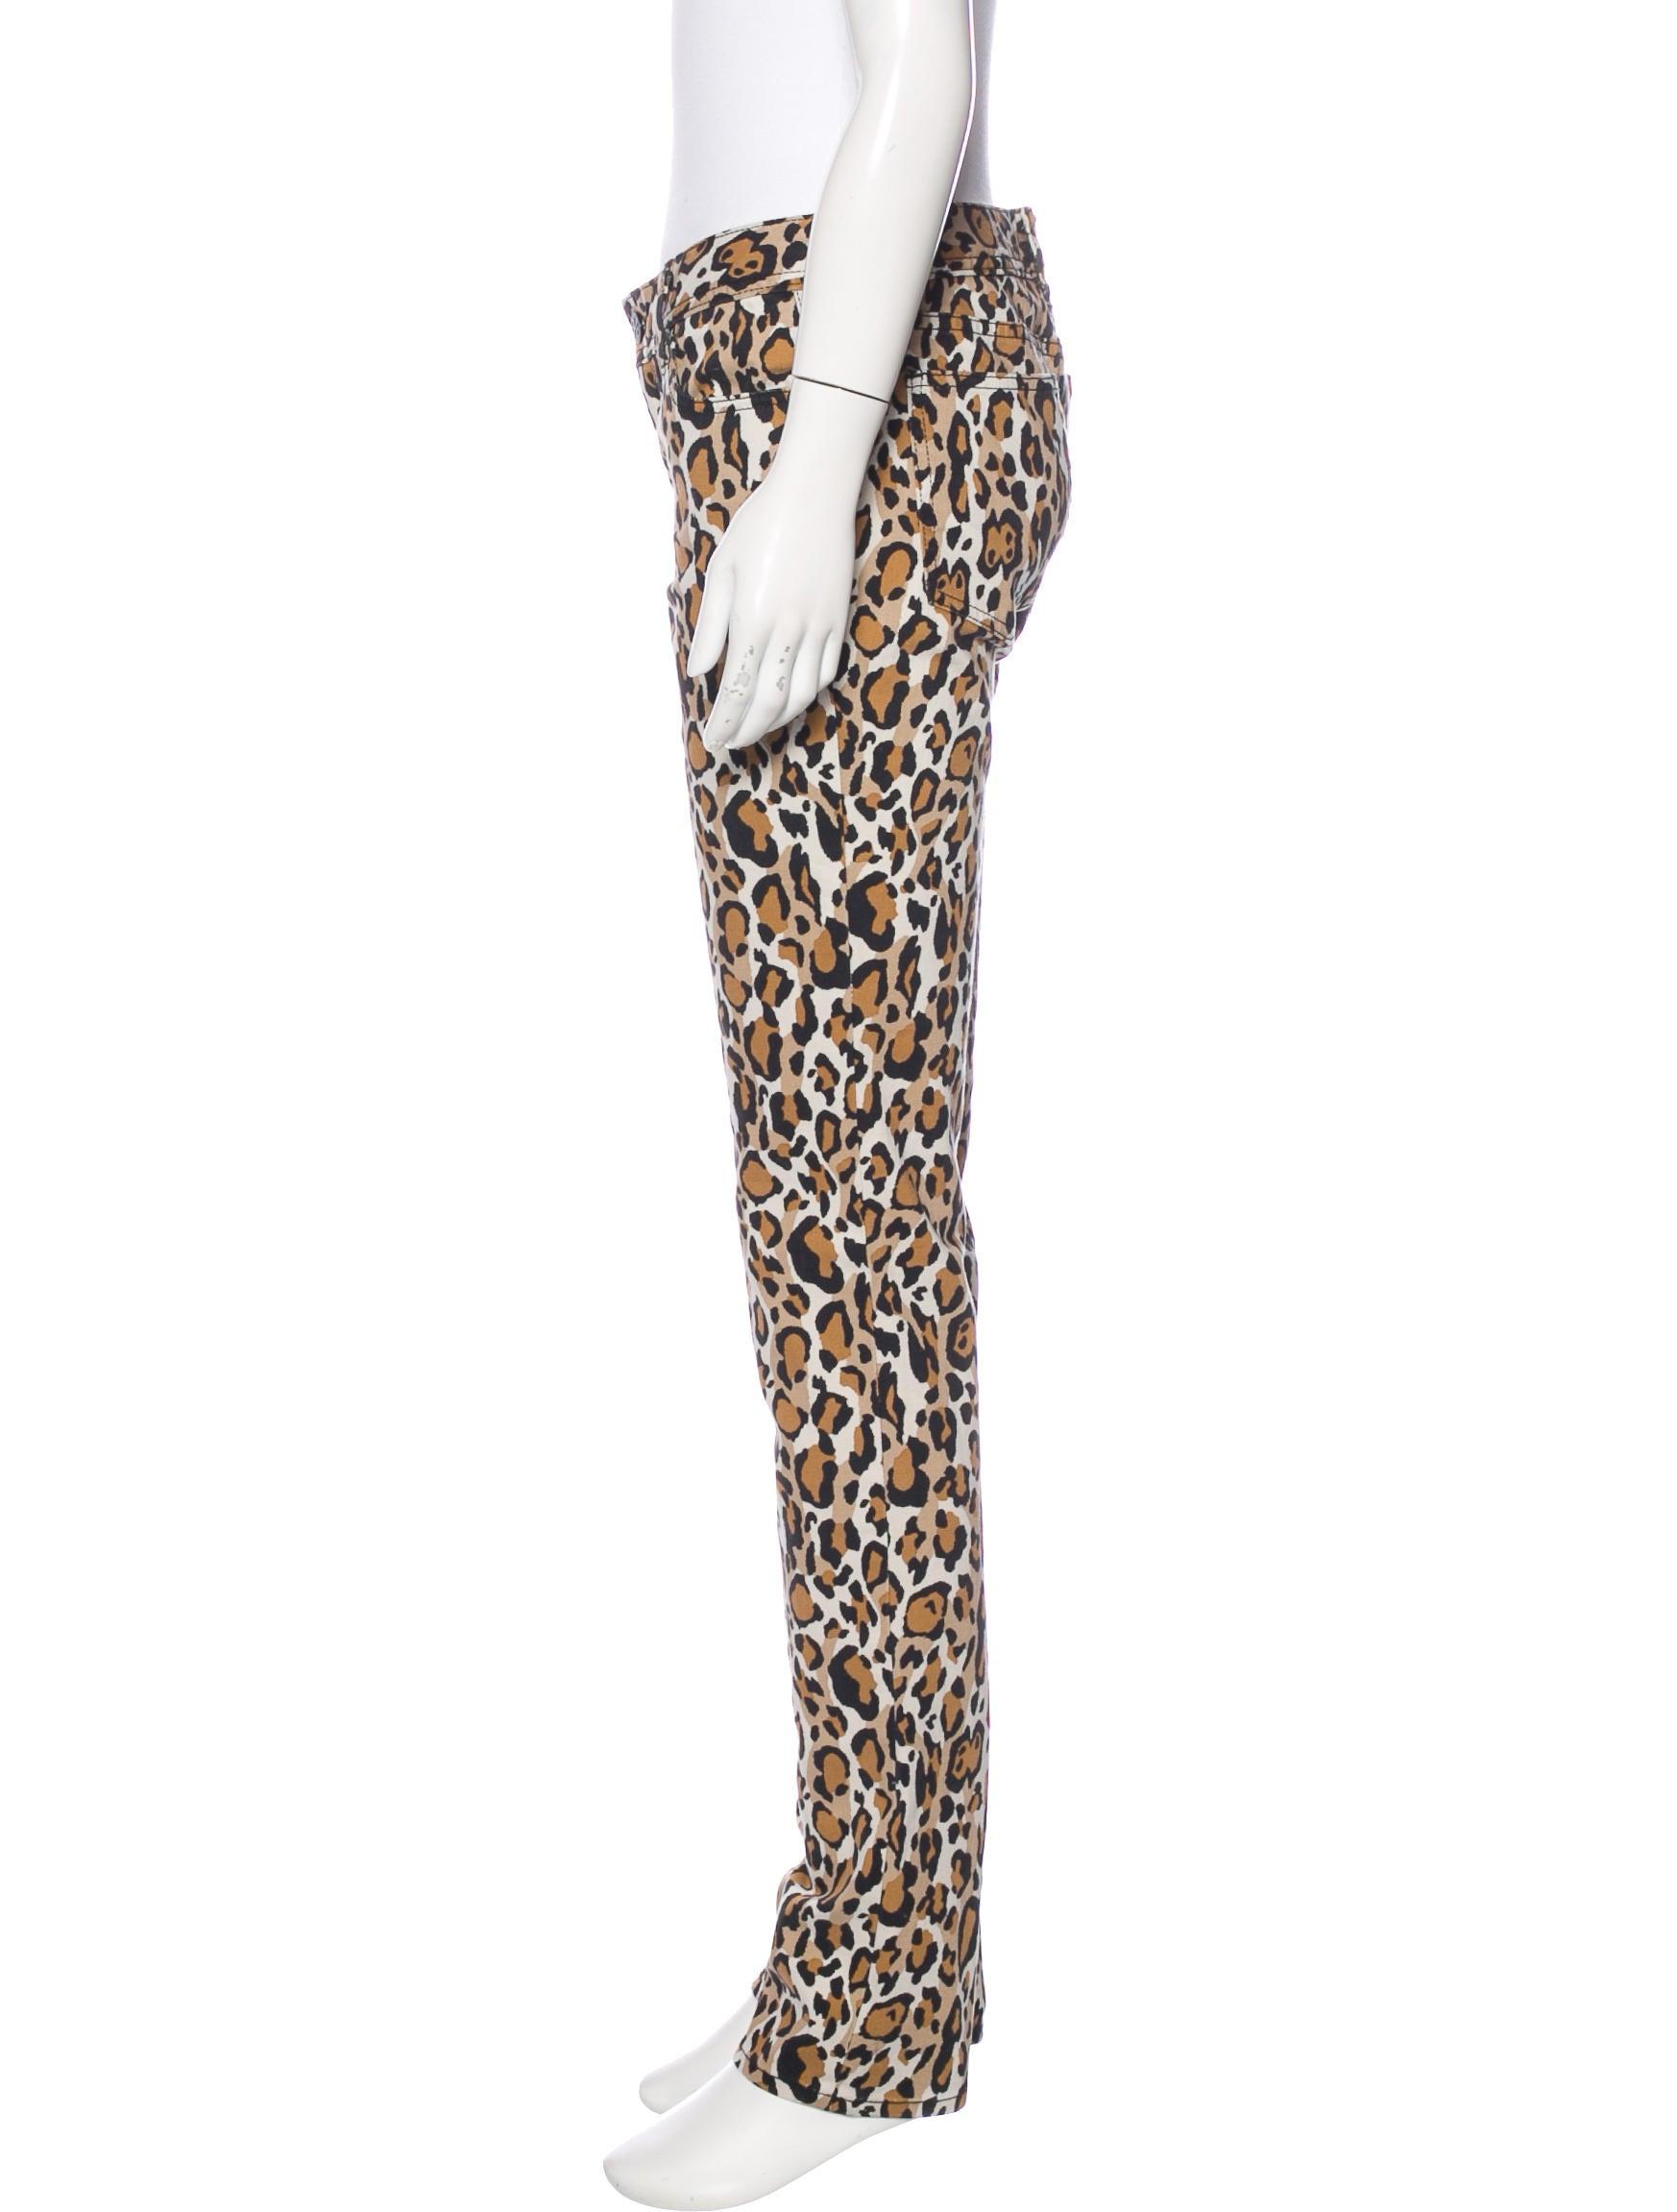 Tory Burch Leopard Print Straight-Jeg Jeans